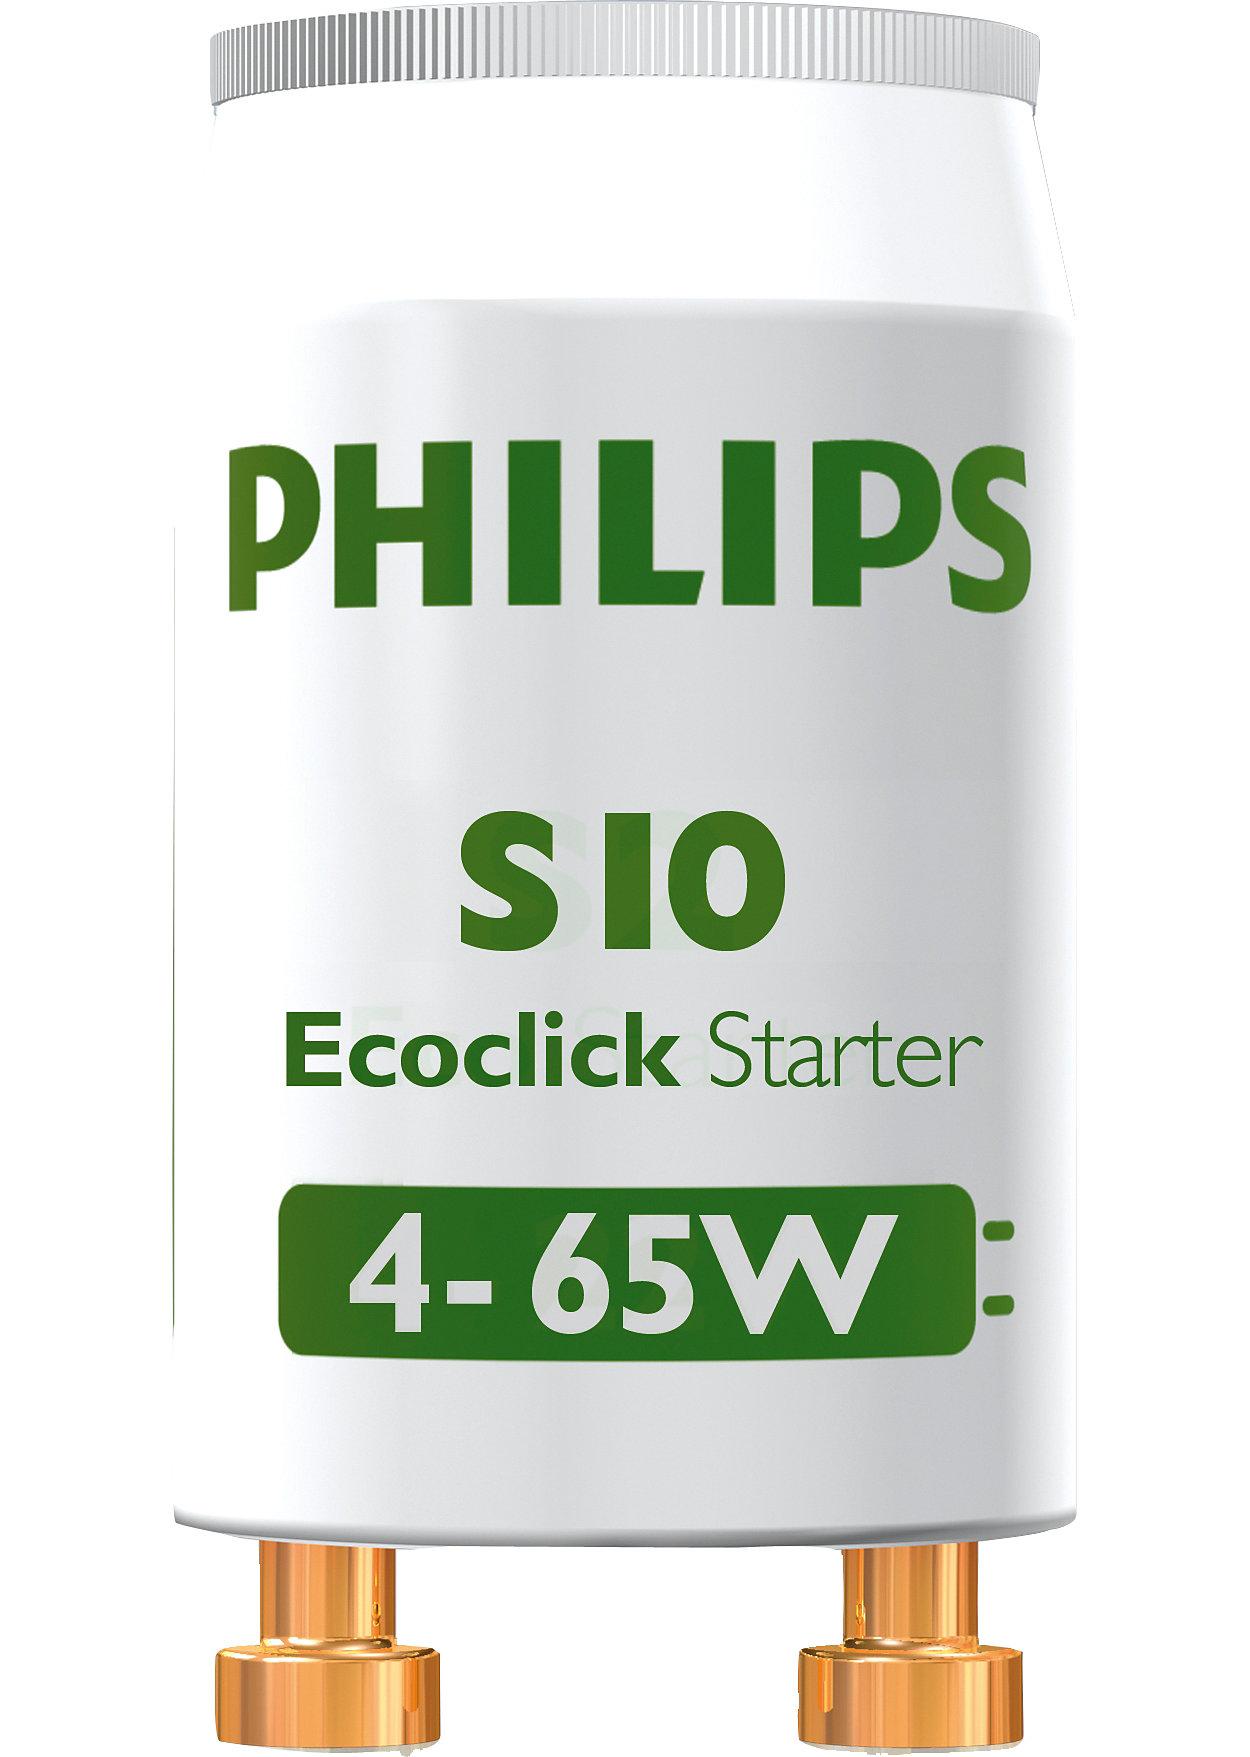 s10 4 65w sin 220 240v wh 2bc 10 green starters philips lighting. Black Bedroom Furniture Sets. Home Design Ideas